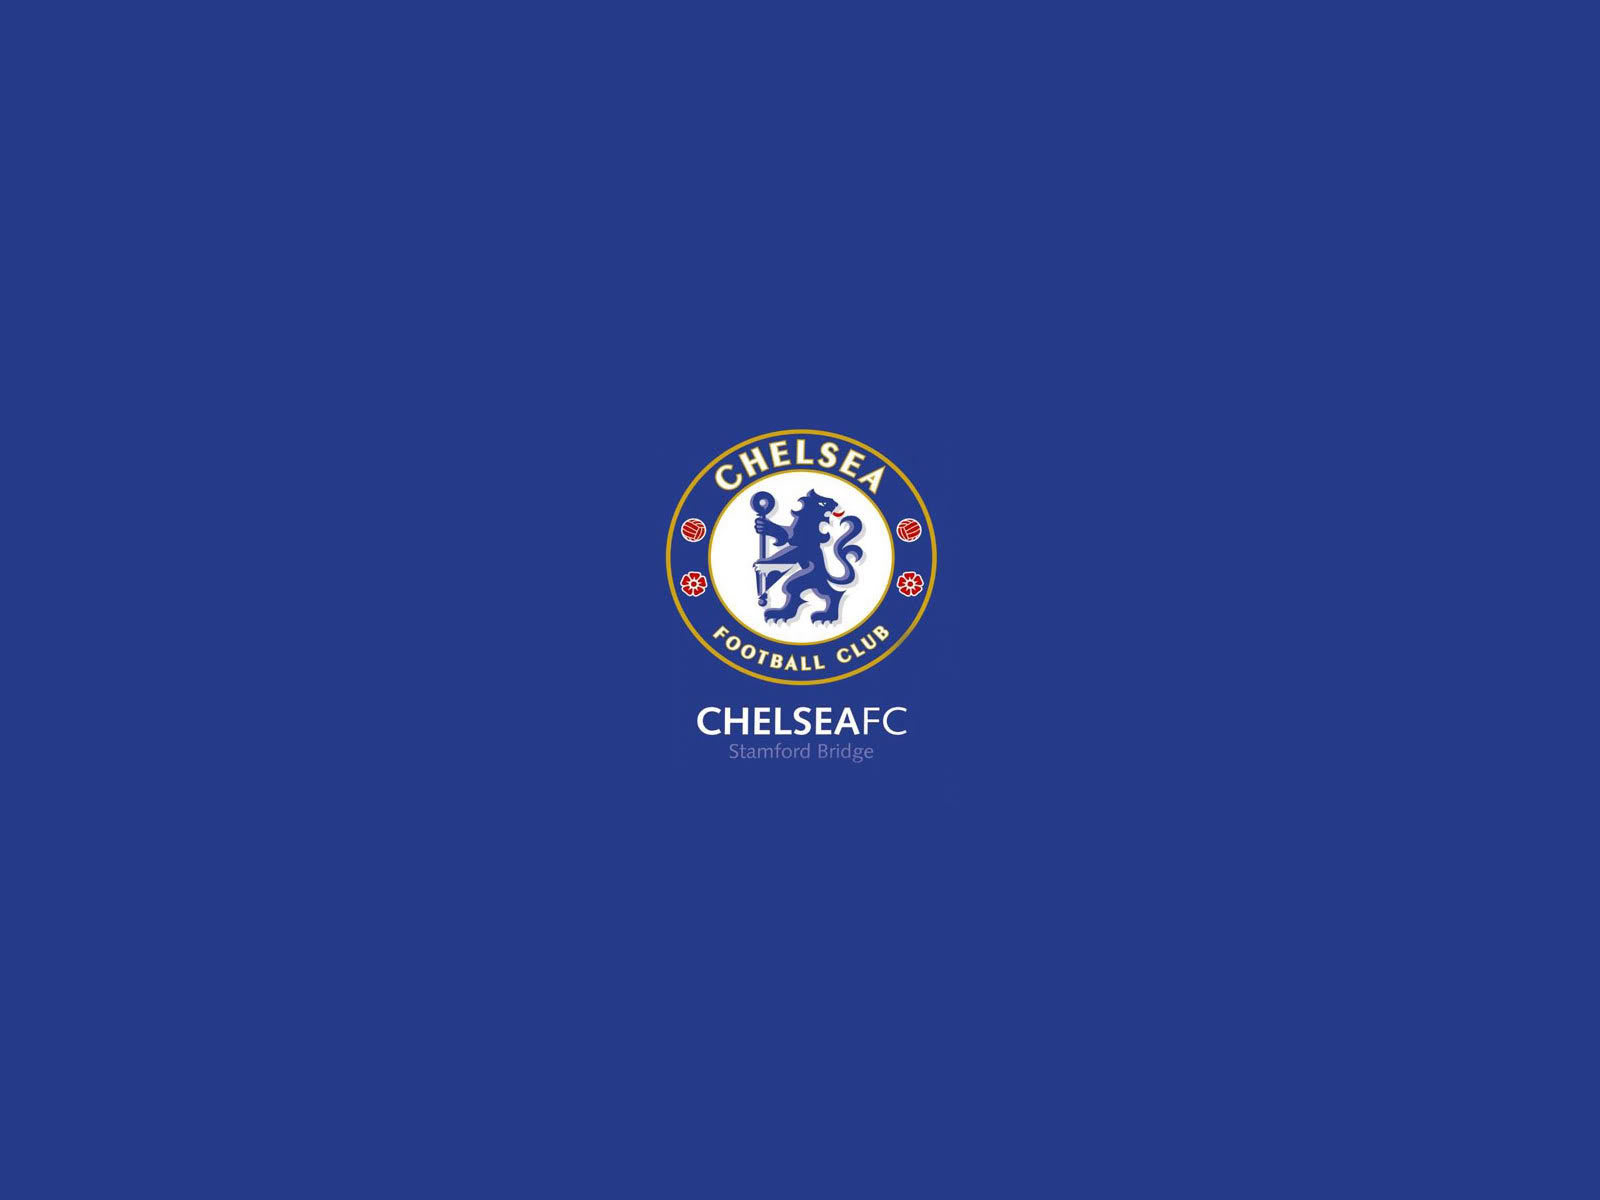 Chelsea FC Wallpaper 6 1600x1200